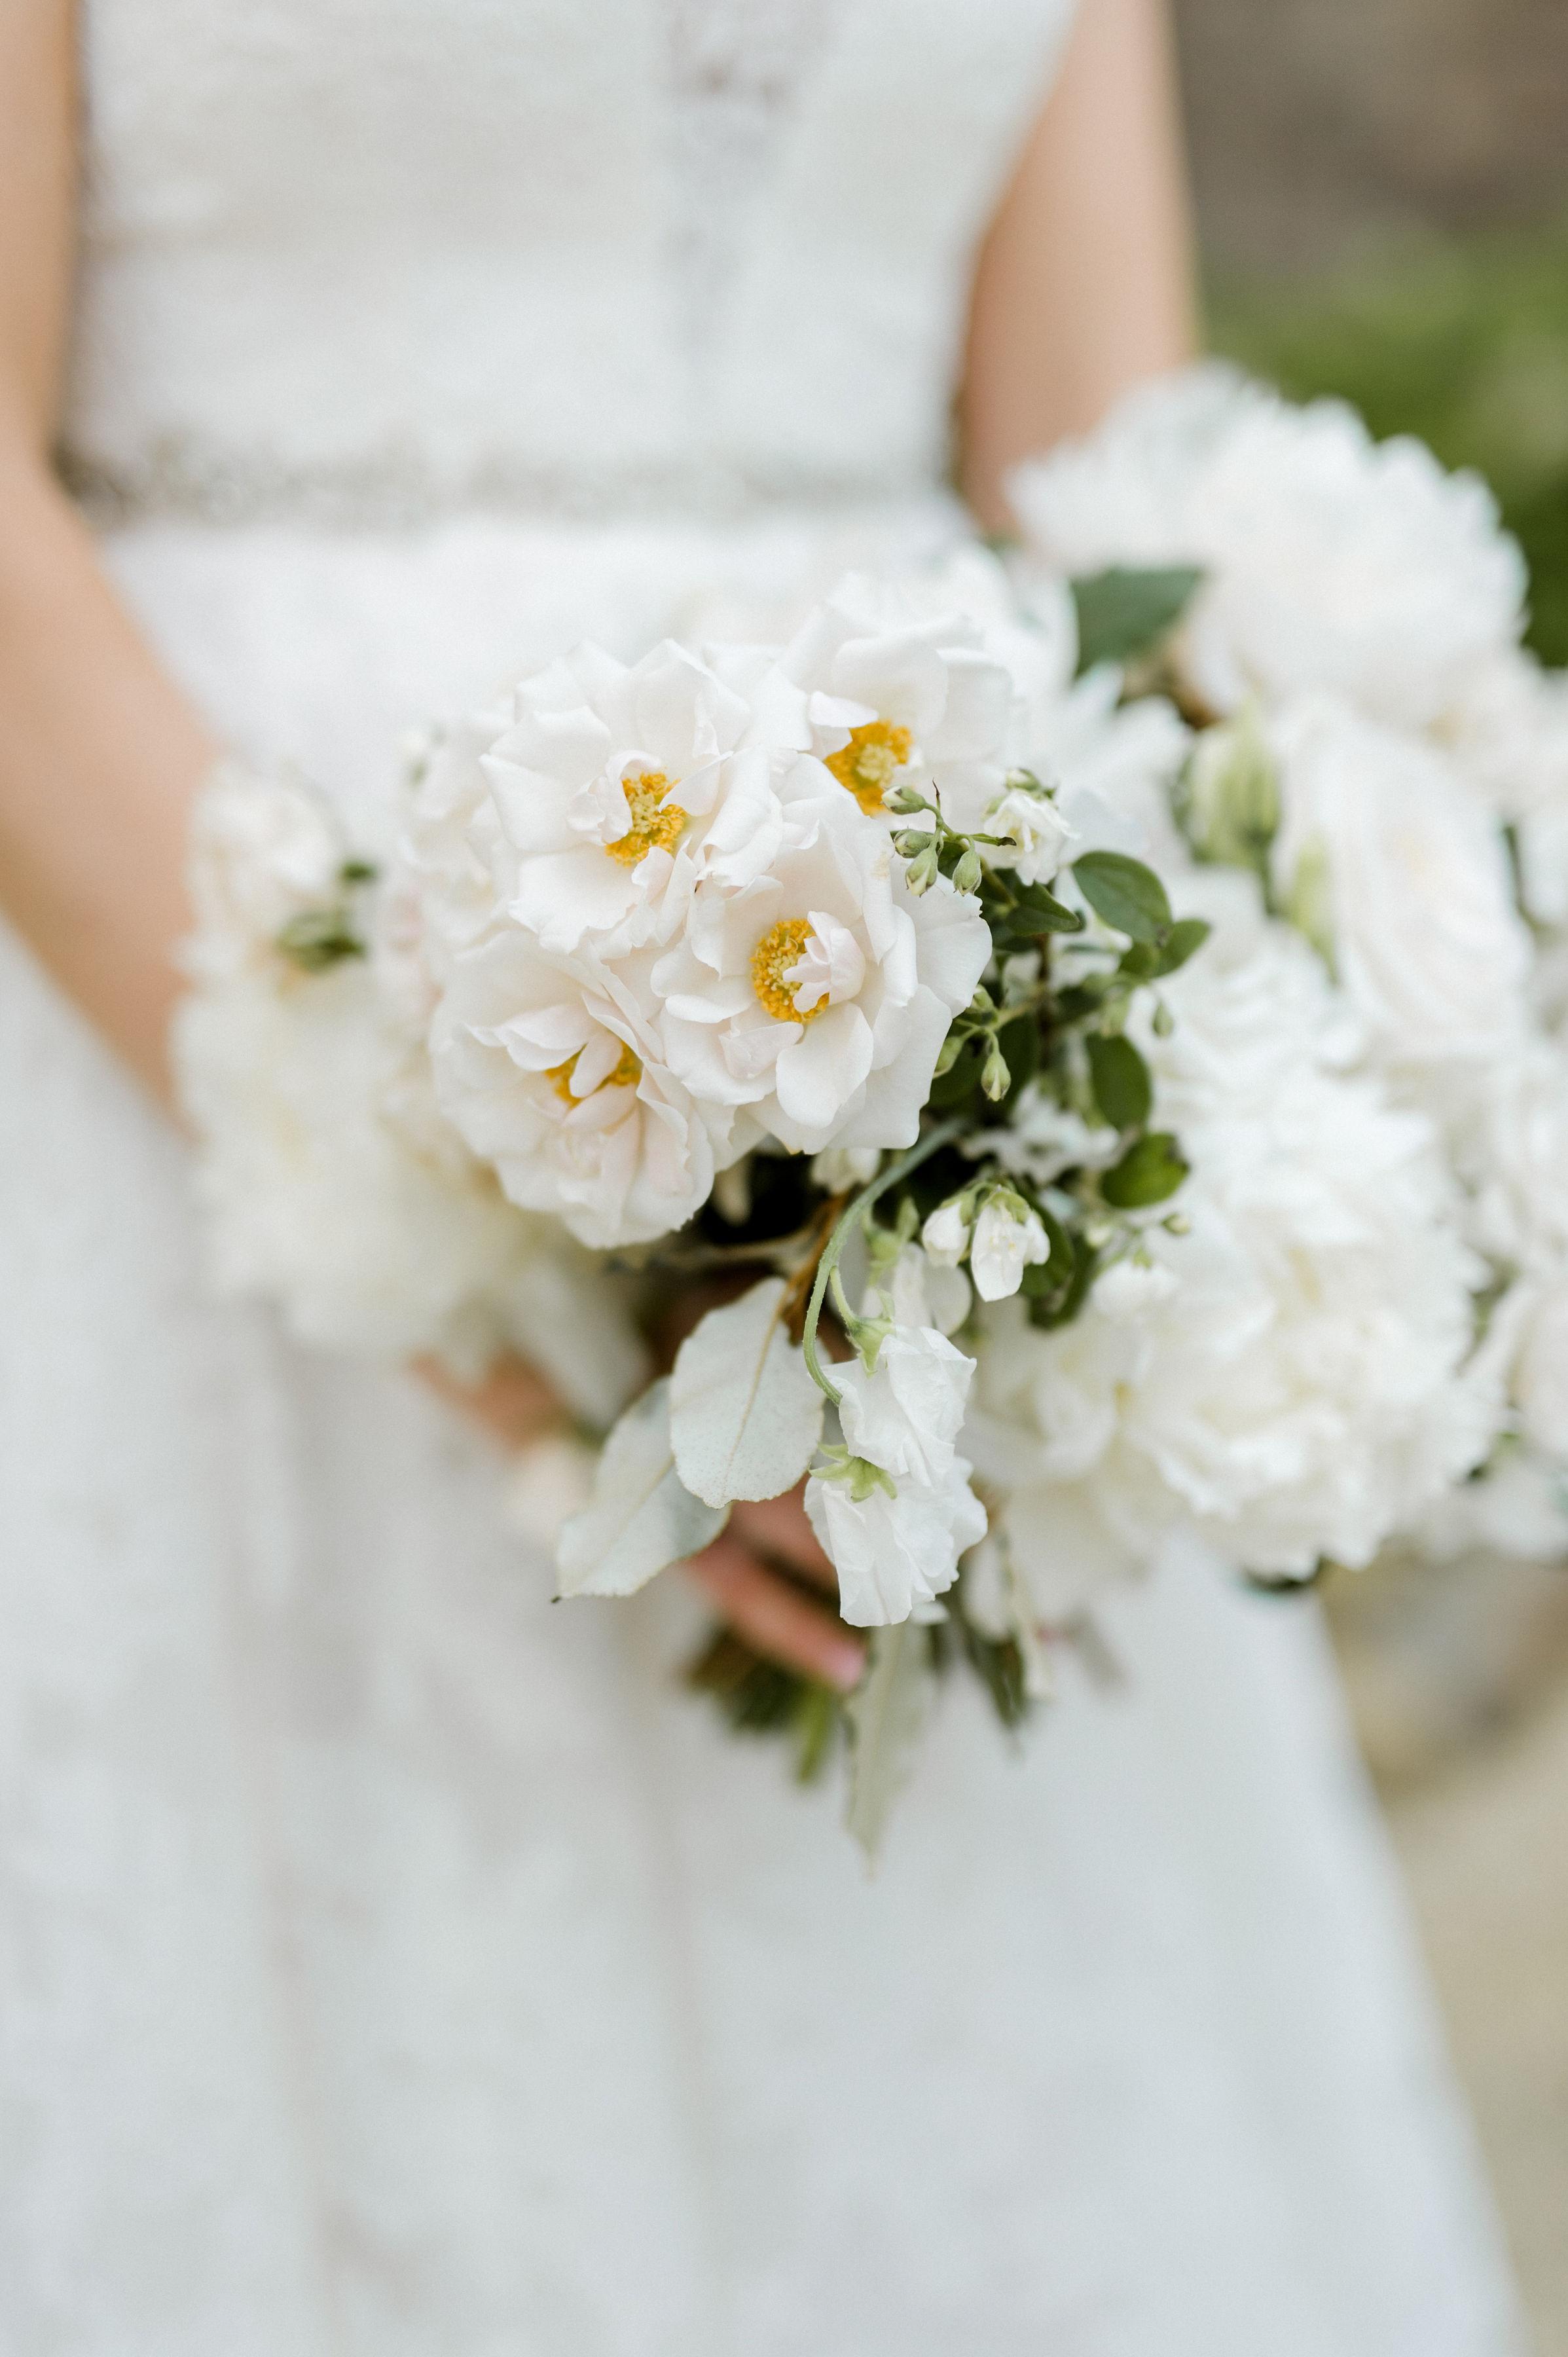 McElravey_Wedding_CarolineLimaPhotography_2018_194.jpg